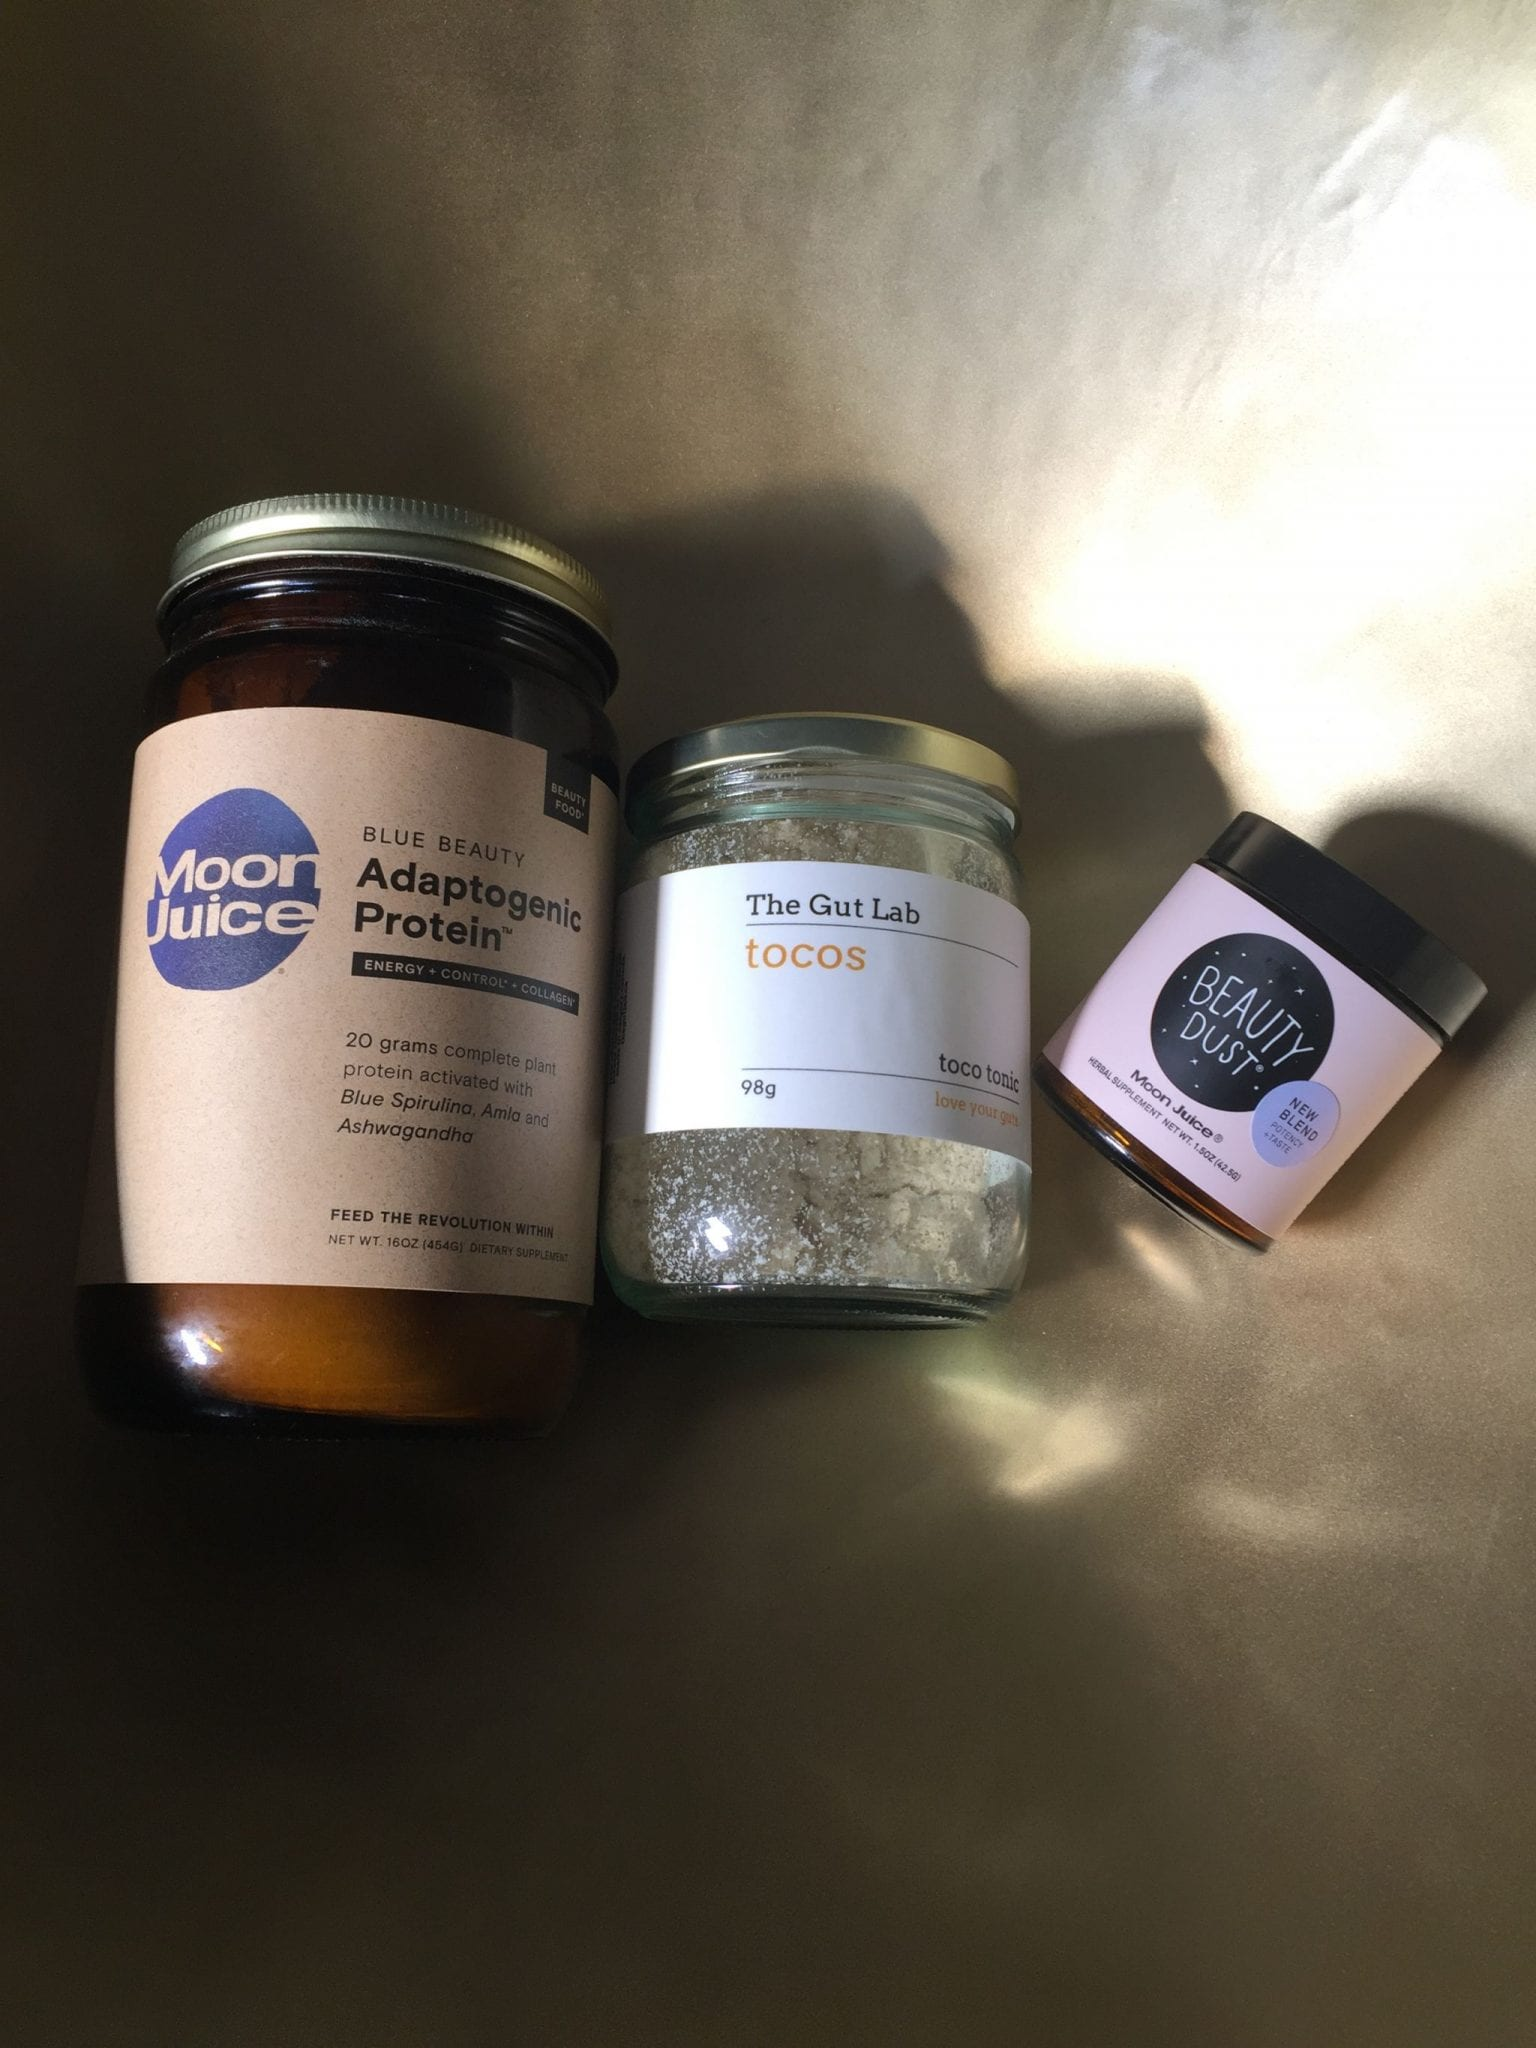 Moon Juice Beauty Dust, Adaptogen Protein and Tocotrienol